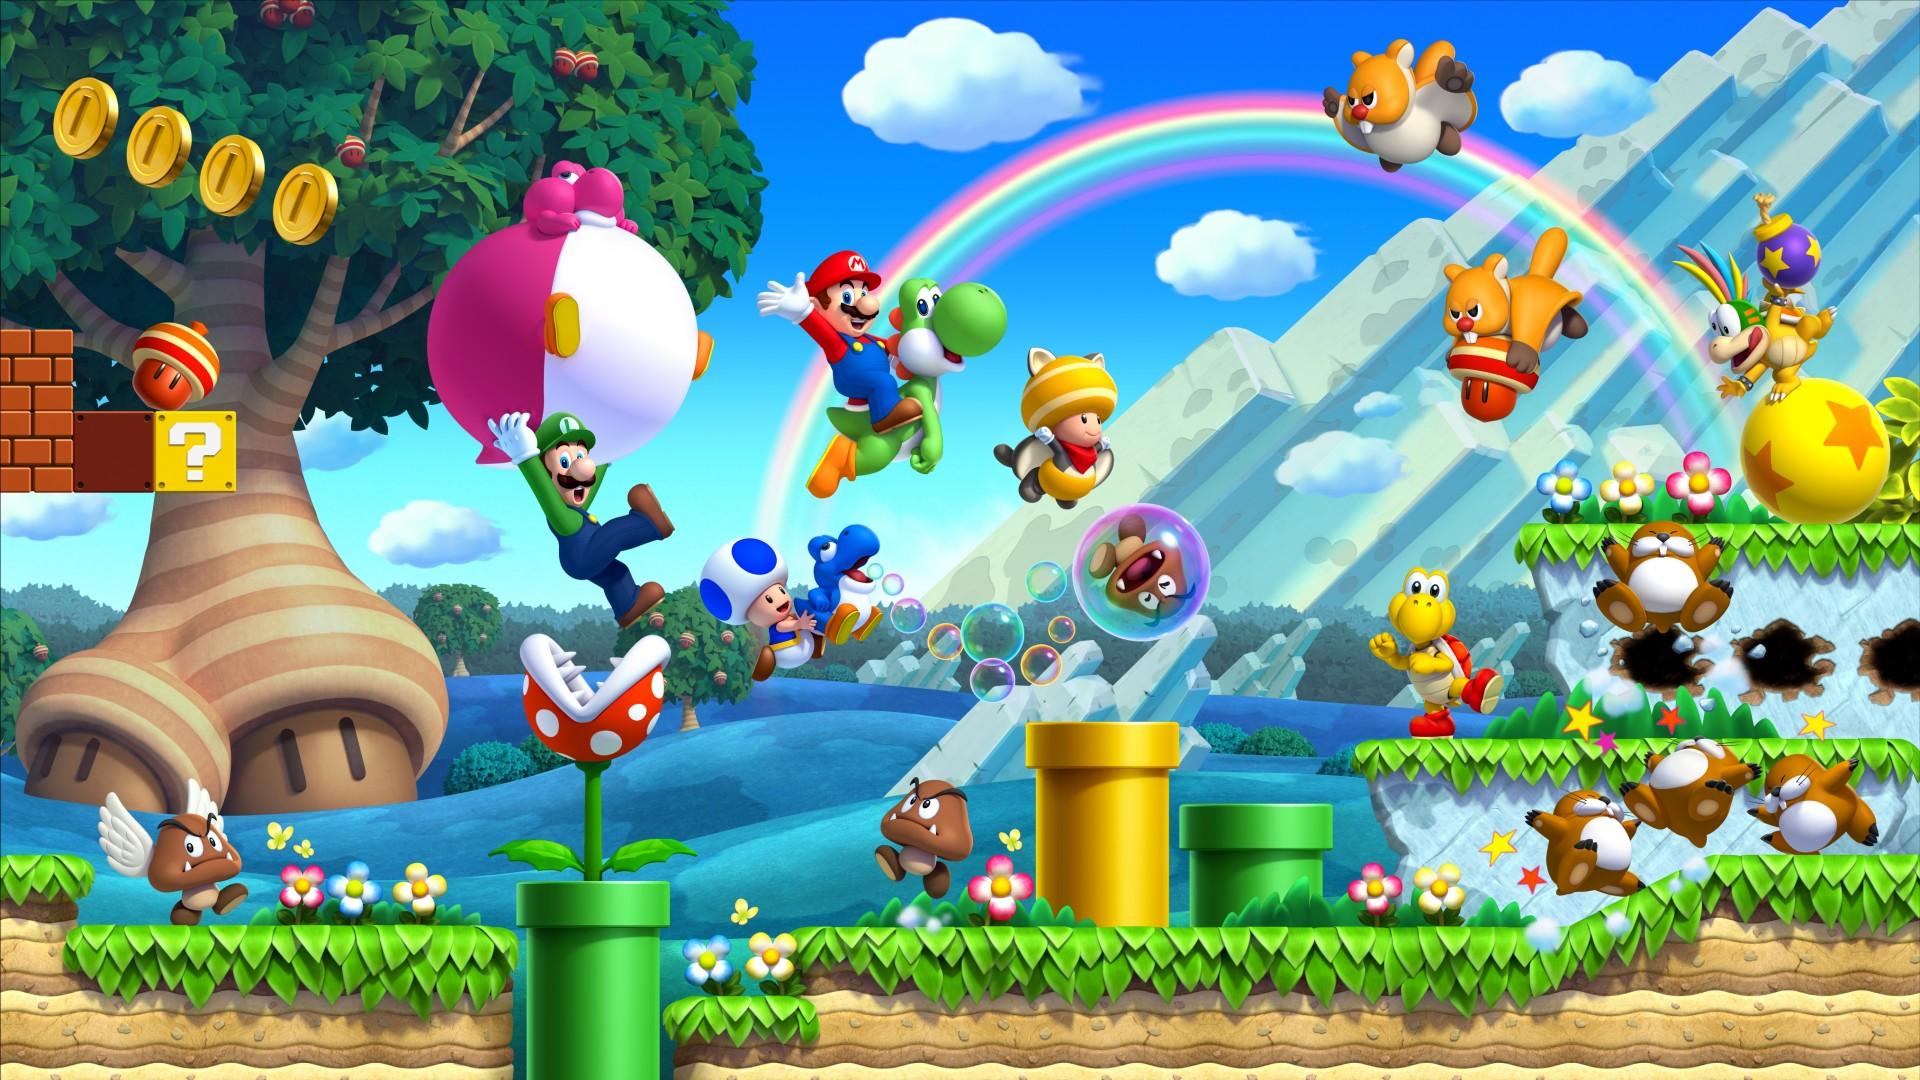 Wallpaper Super Mario Odyssey 4k 5k E3 2017 Games 13716